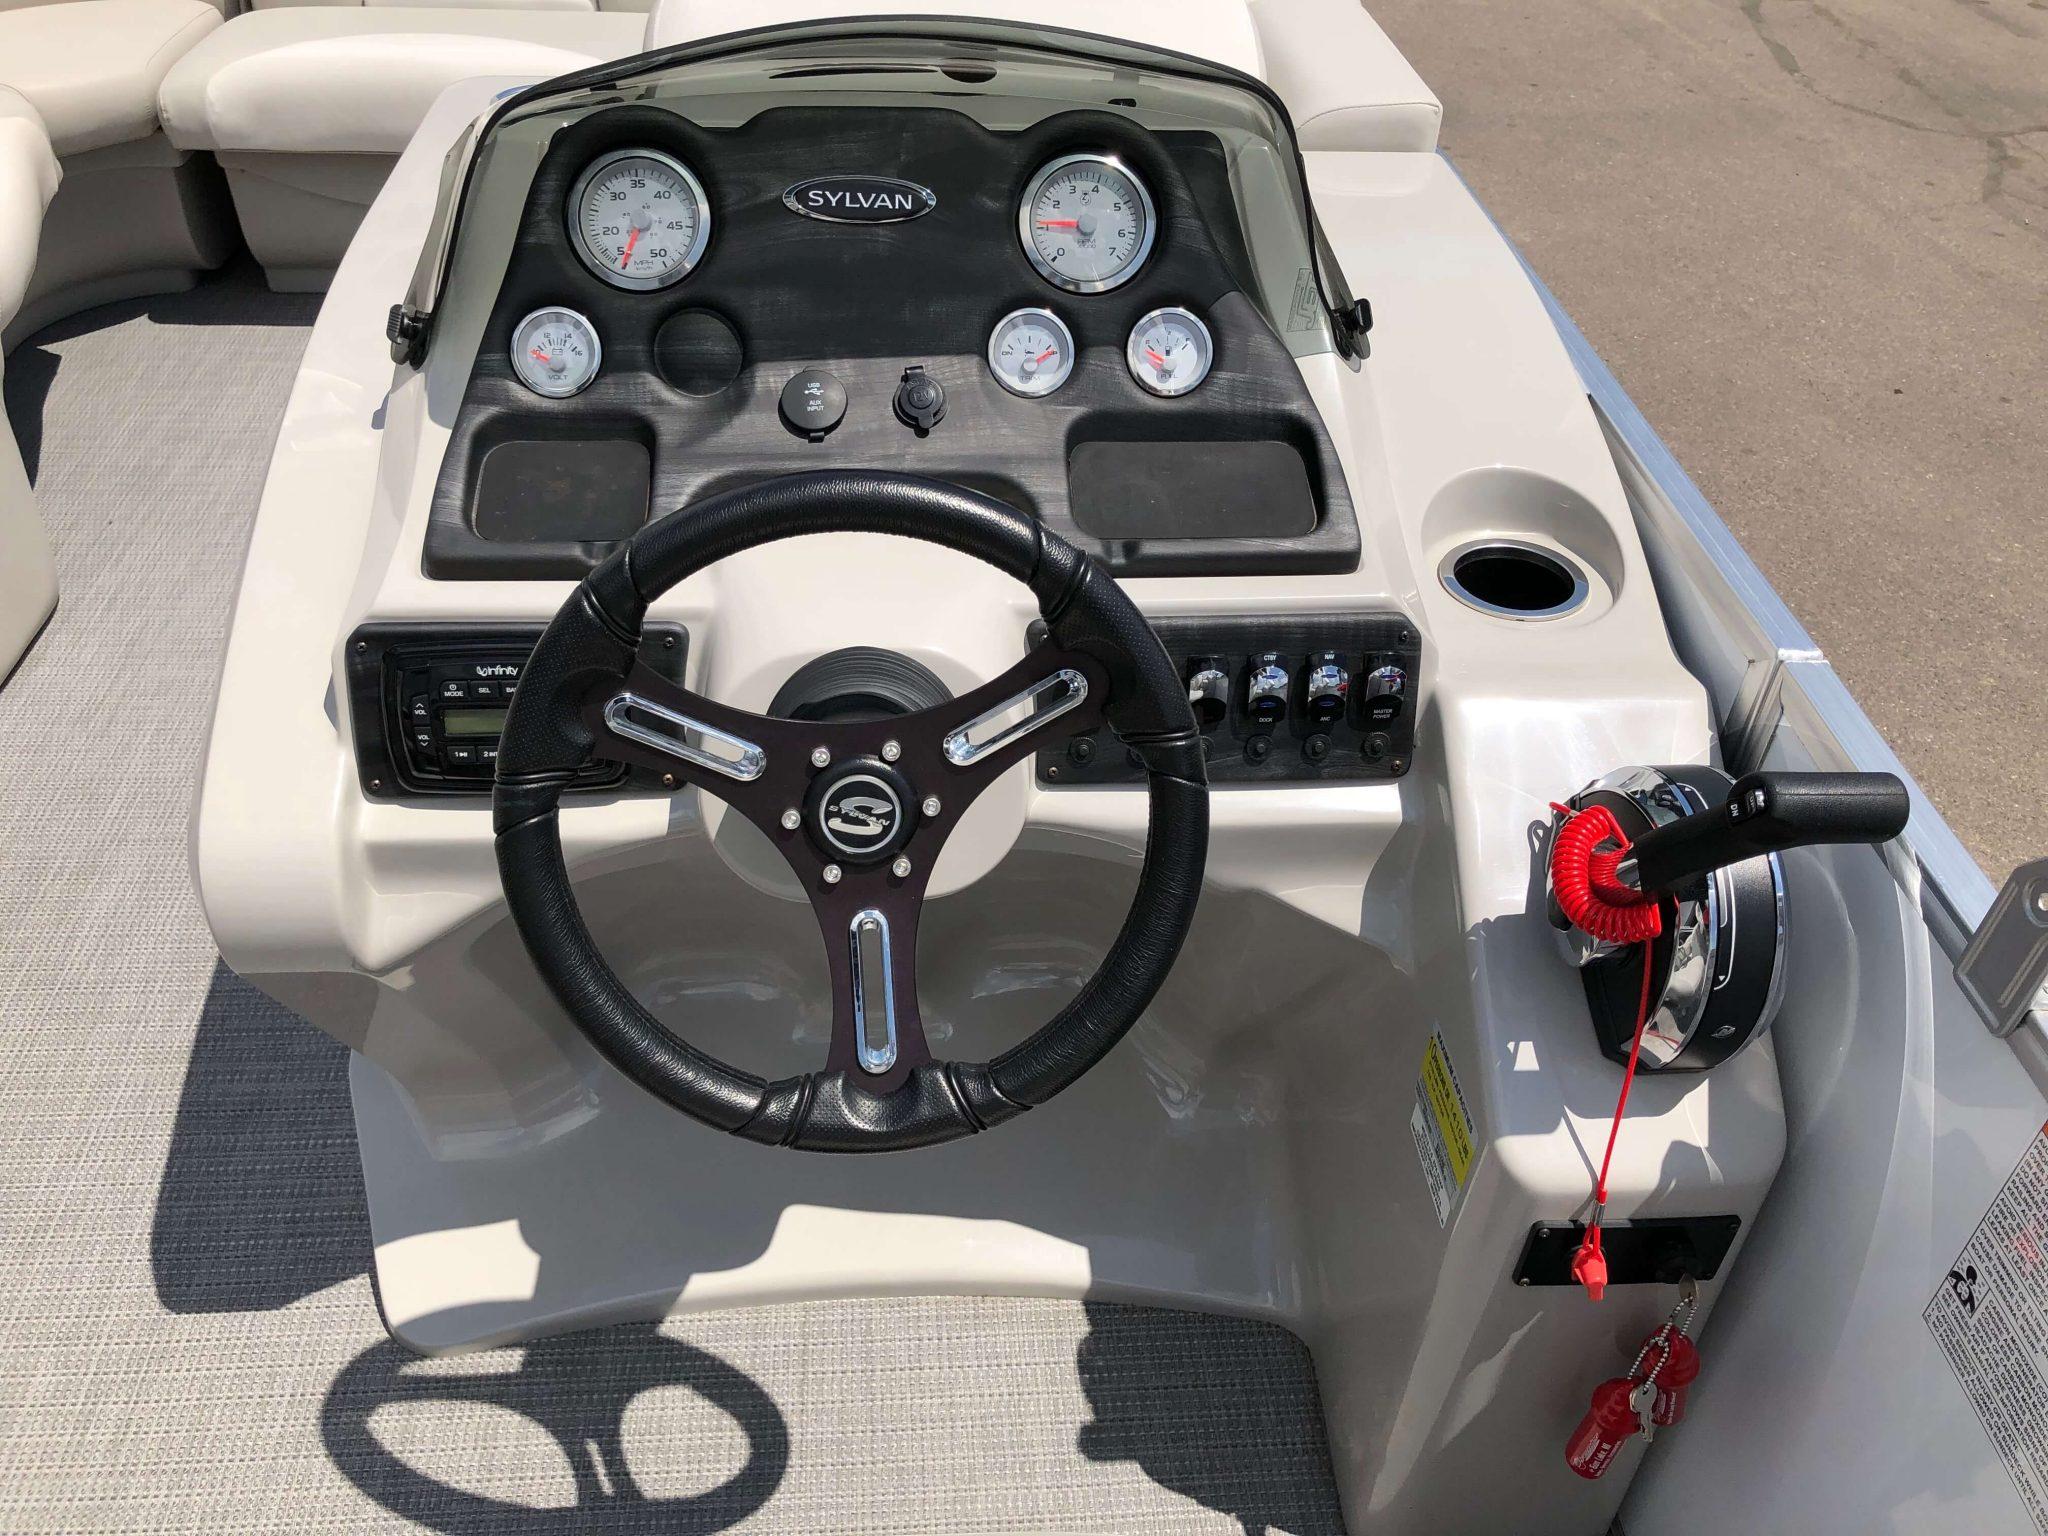 2016 Sylvan 8520 LZ LES Pontoon Boat Dash 2